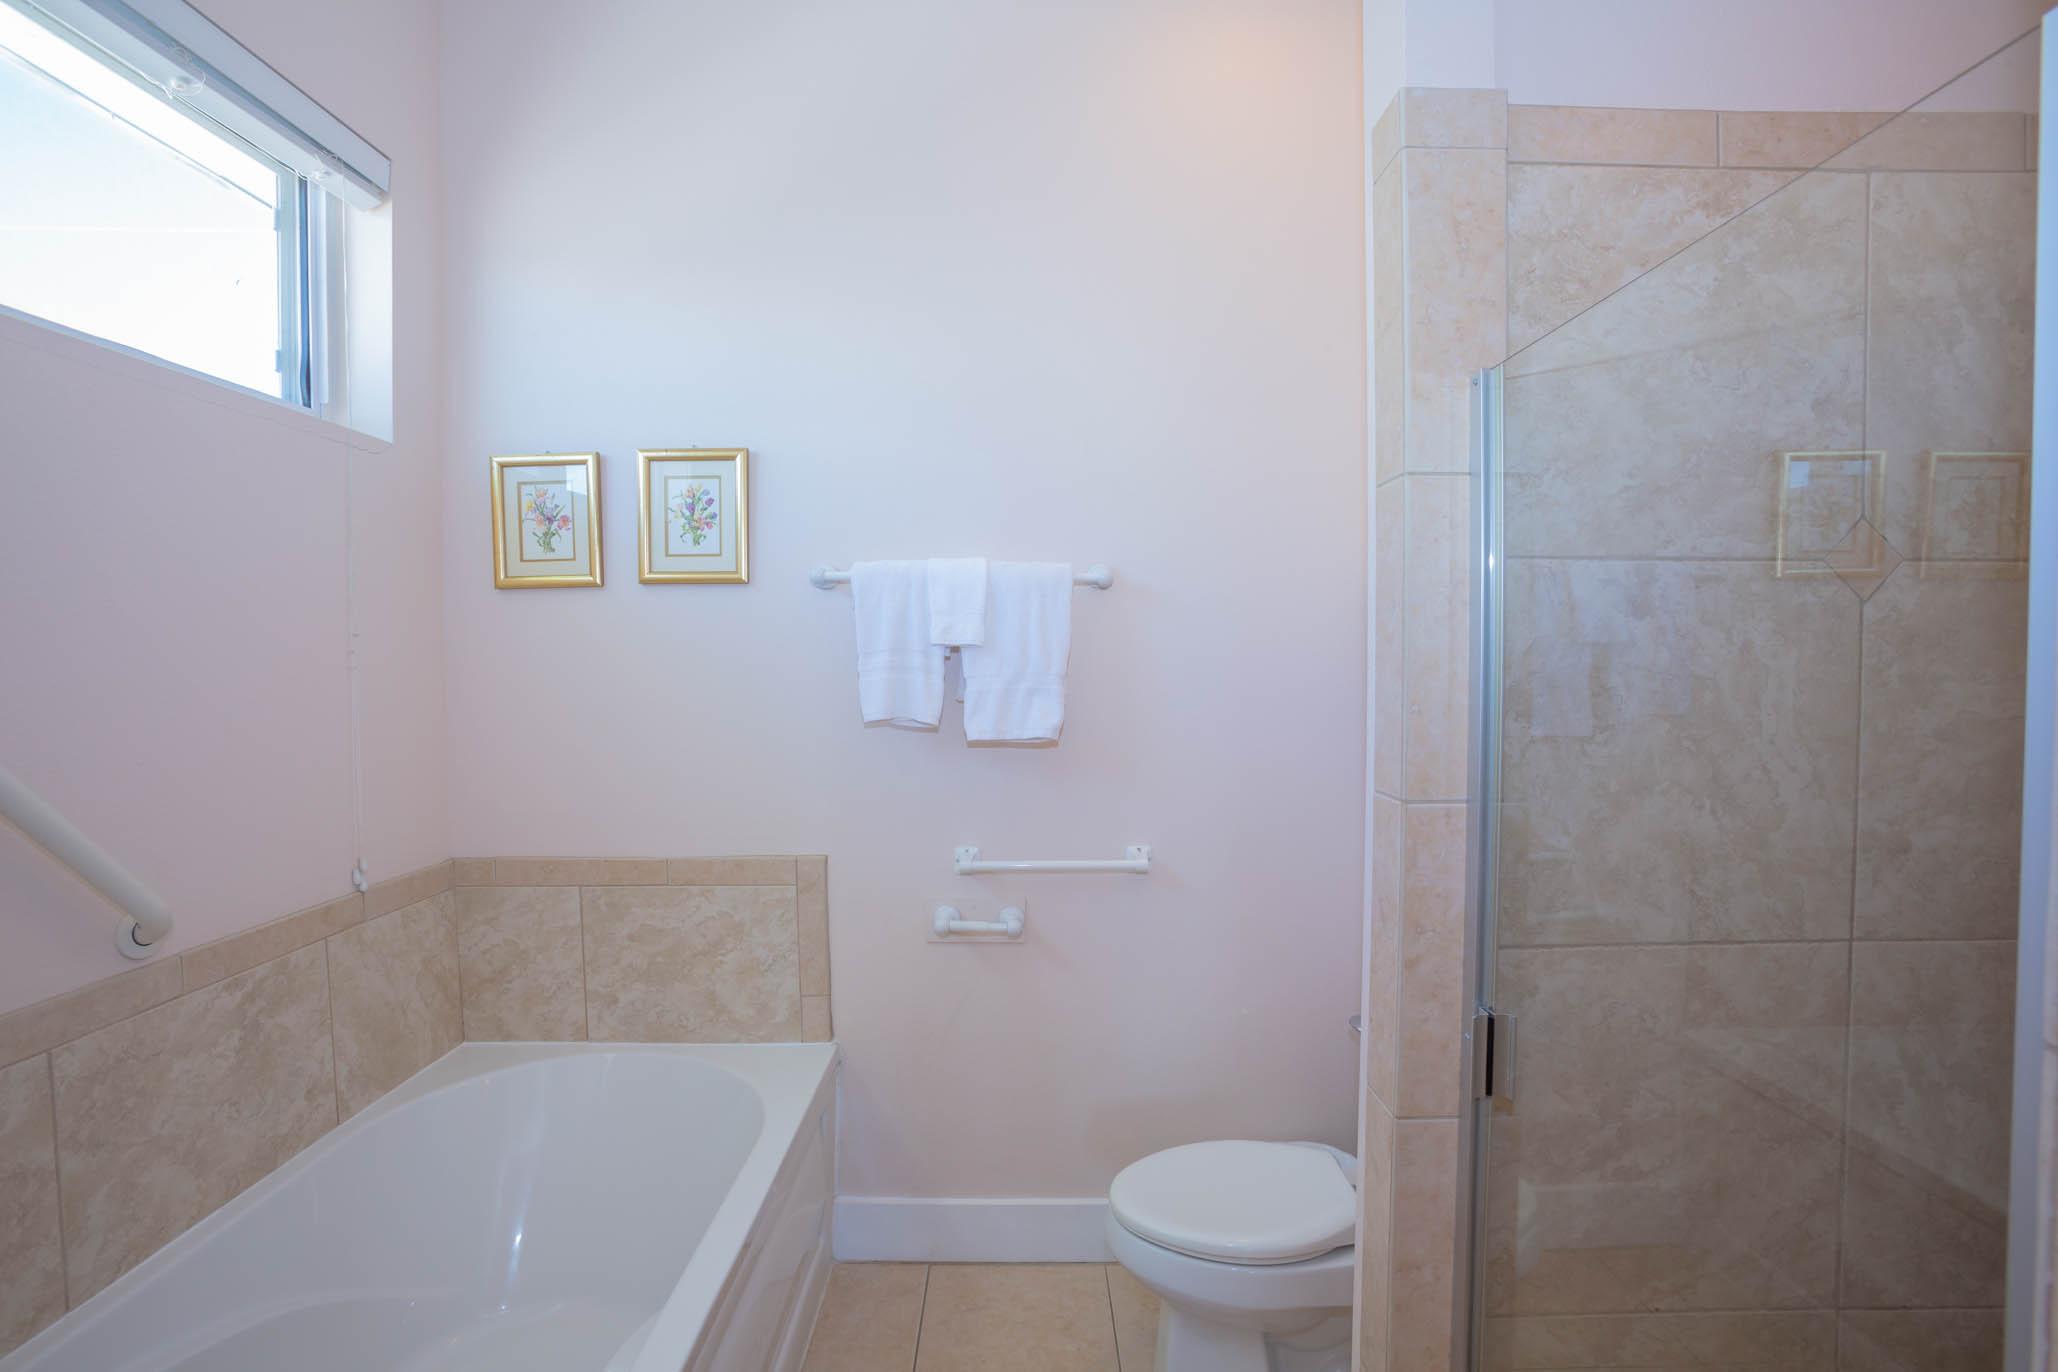 Ariola 1214 House/Cottage rental in Luxury Homes in Pensacola Beach Florida - #37